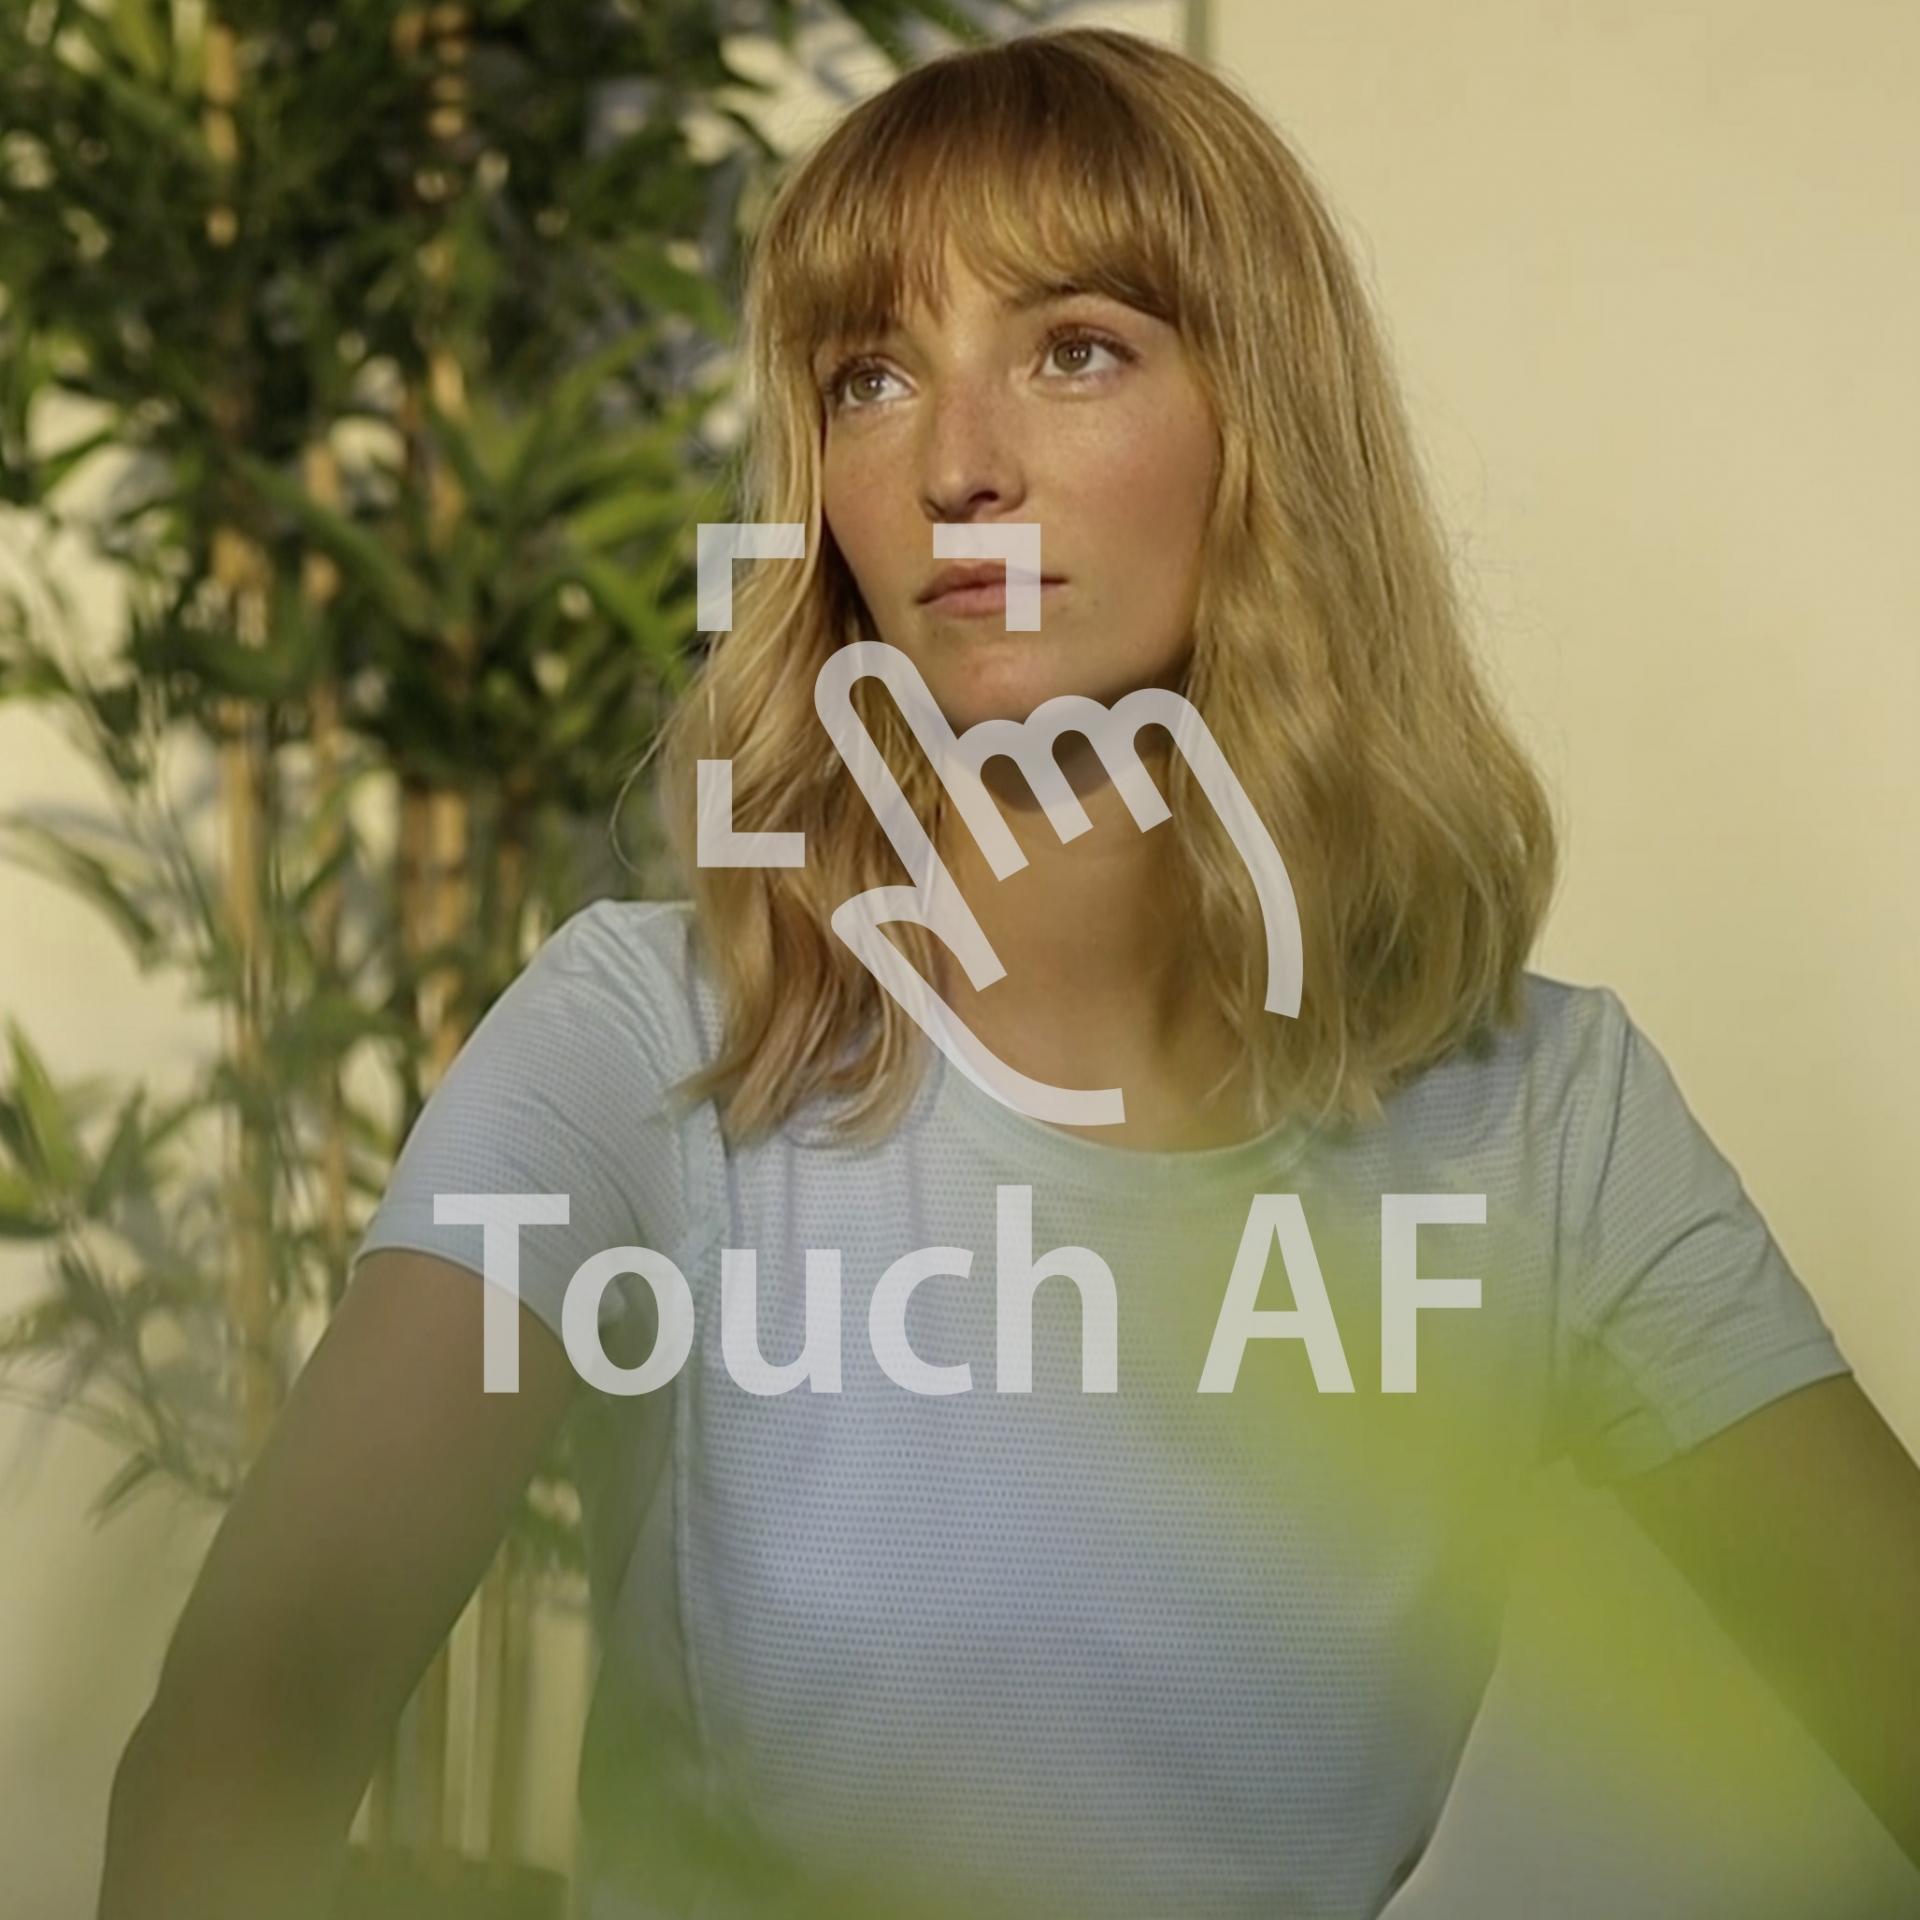 Canon, Filmen mit der EOS, Autofokus, Touch Autofocus